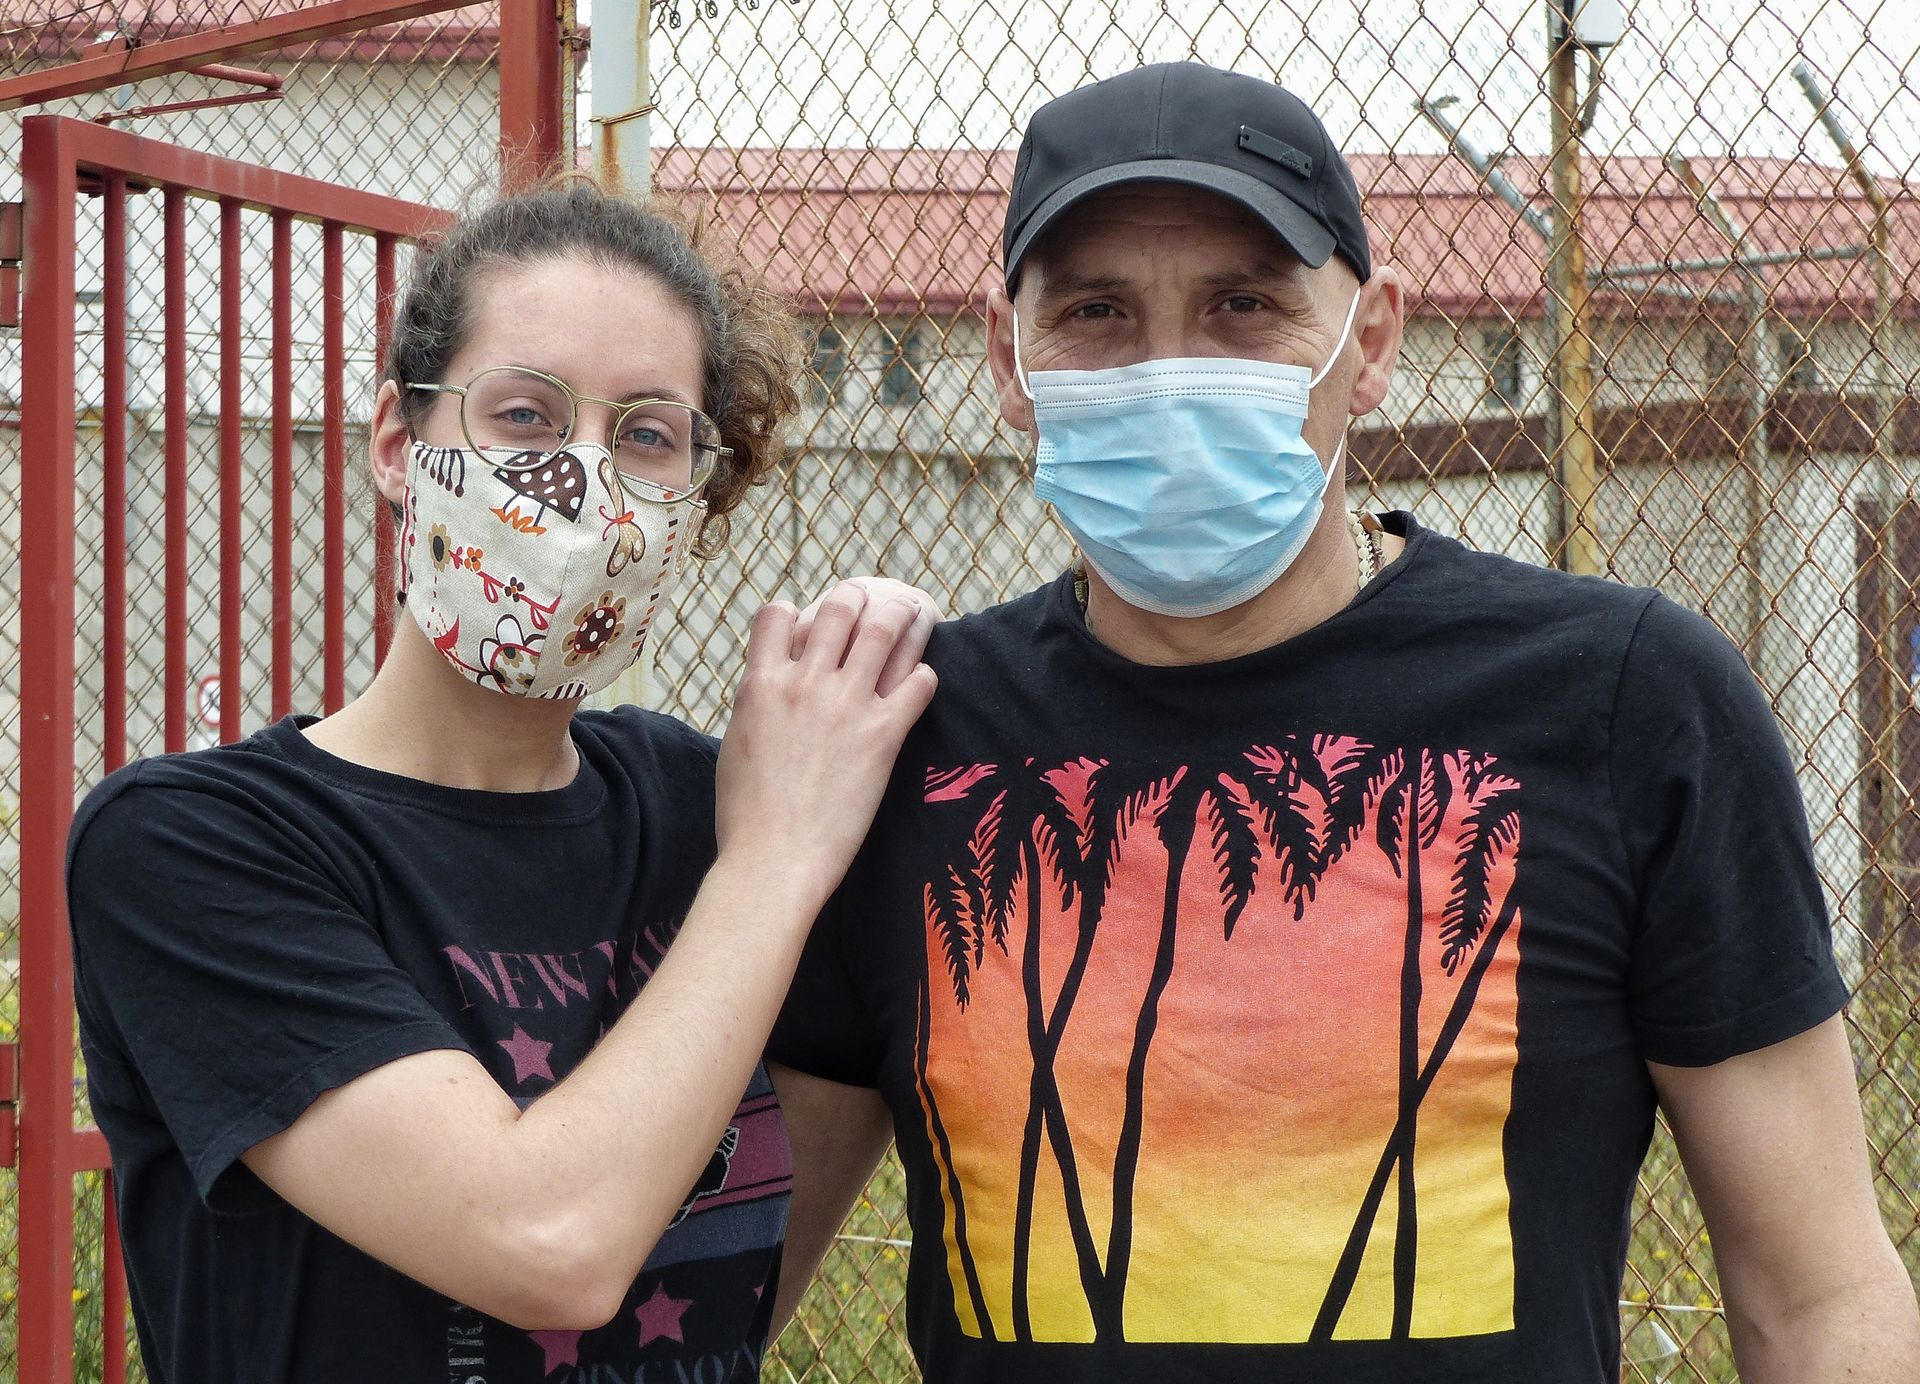 reportaje-prisiones-felix-e-hija-030620.jpg